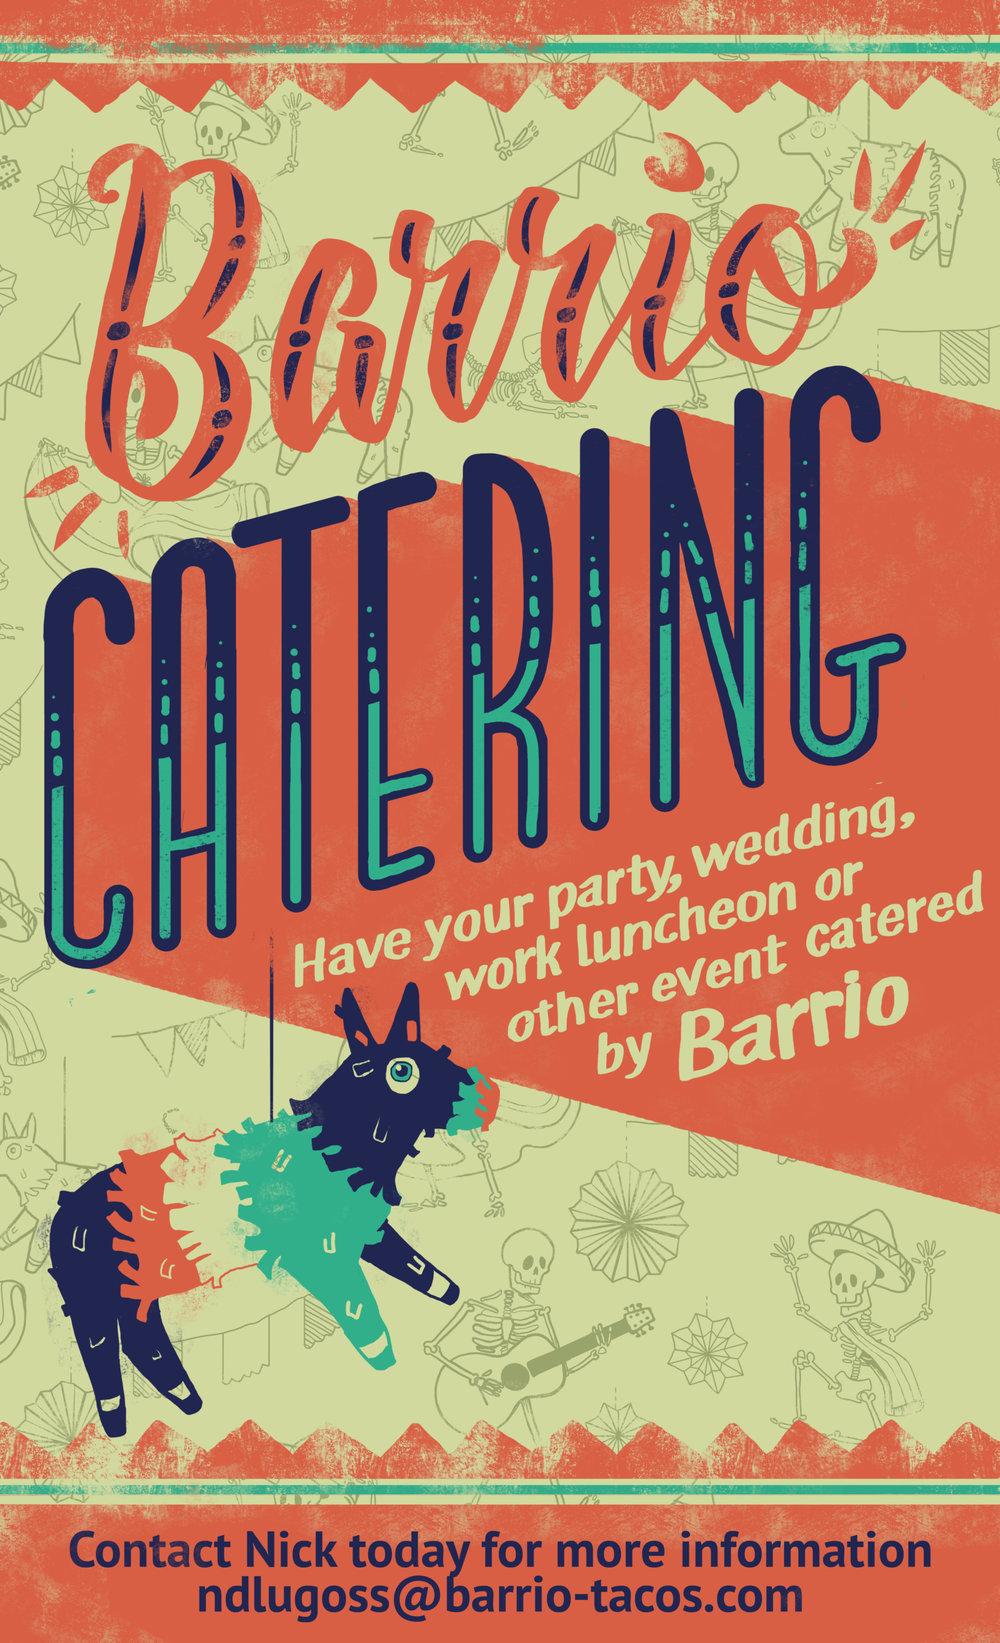 Barrio-Catering-Edit_poster-Merged_02.jpg